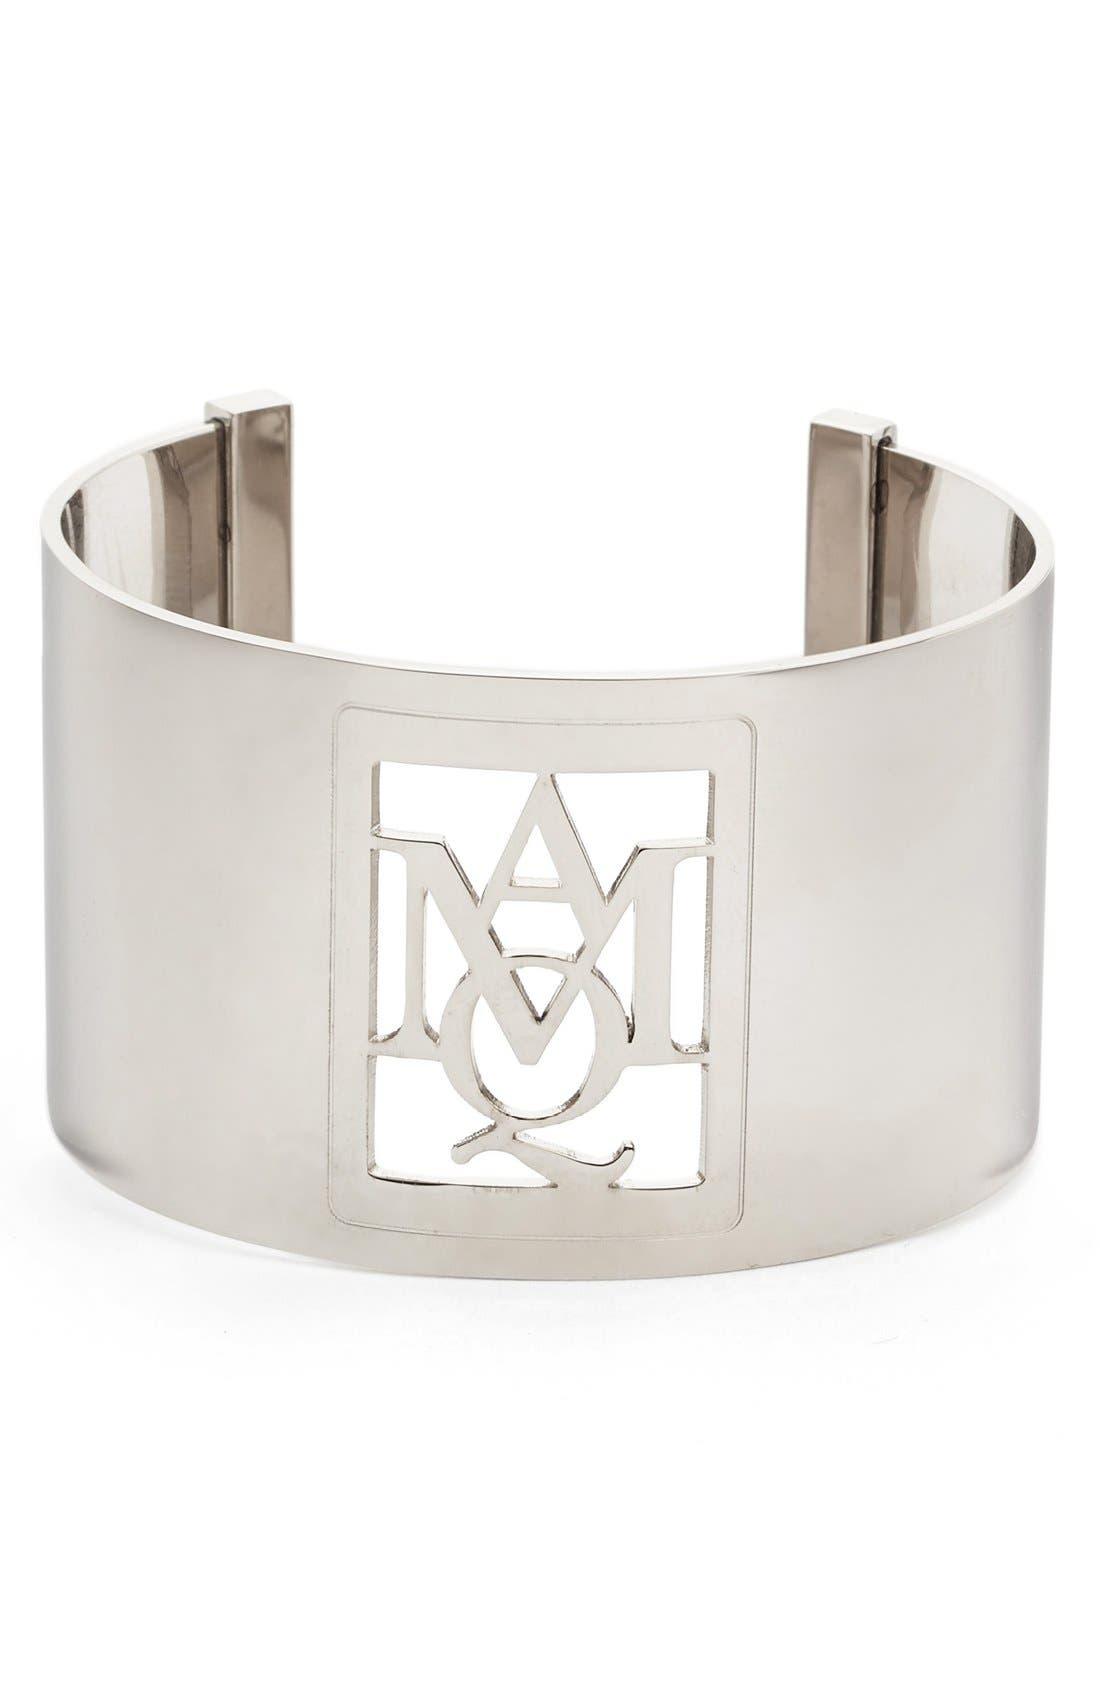 Alexander McQueen Silver Insignia Cuff